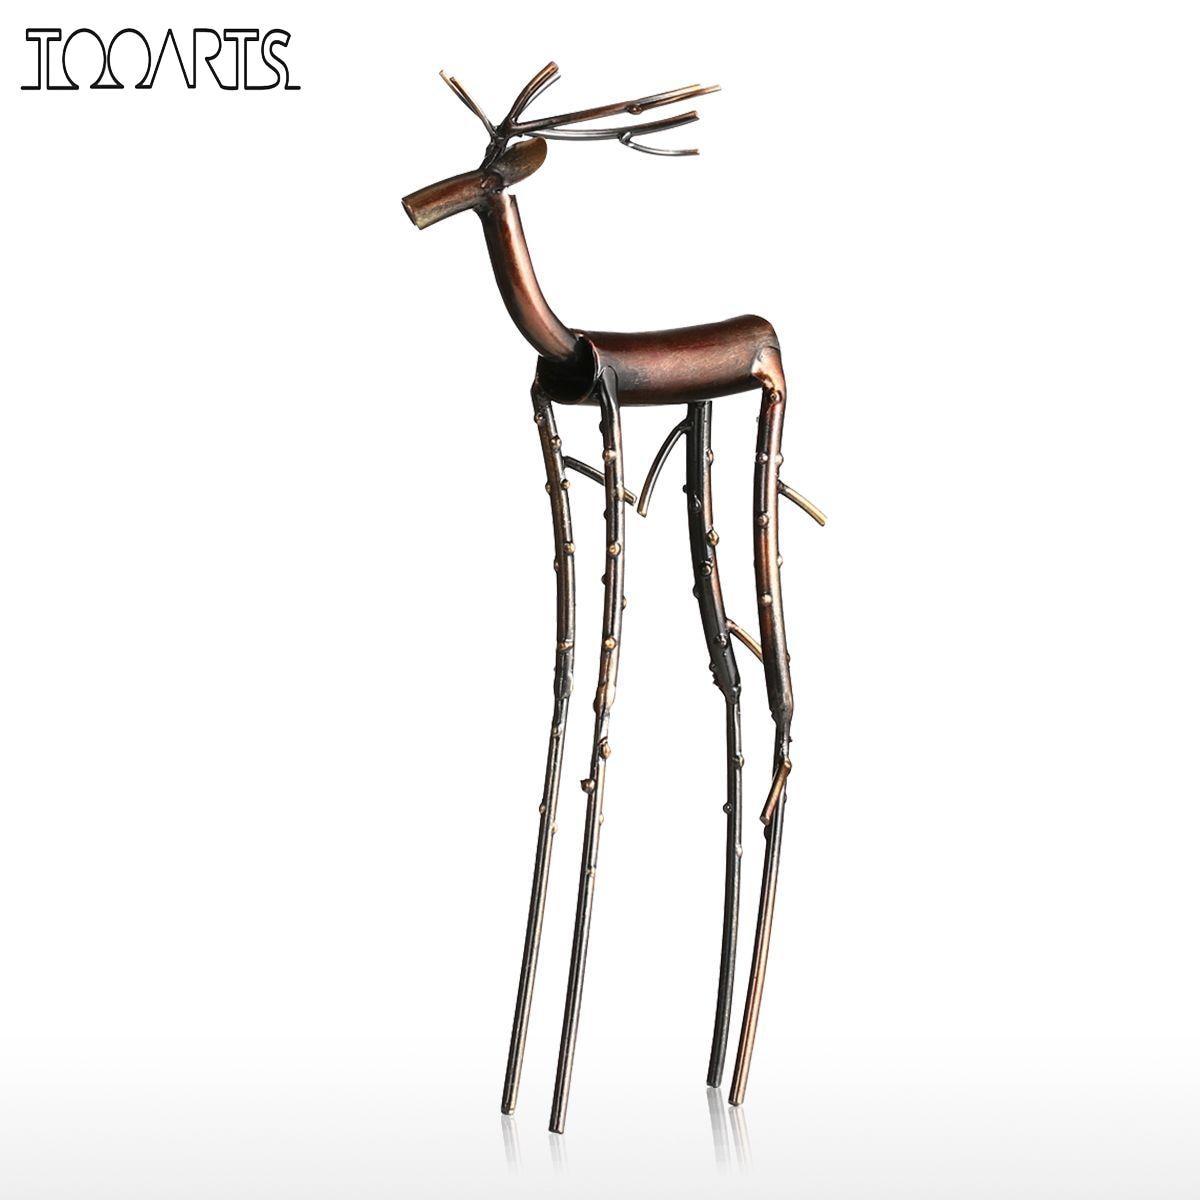 Tooarts Black Long Leg Moose Figurine Iron Home Rhaliexpress: Moose Figurines In Home Decor At Home Improvement Advice